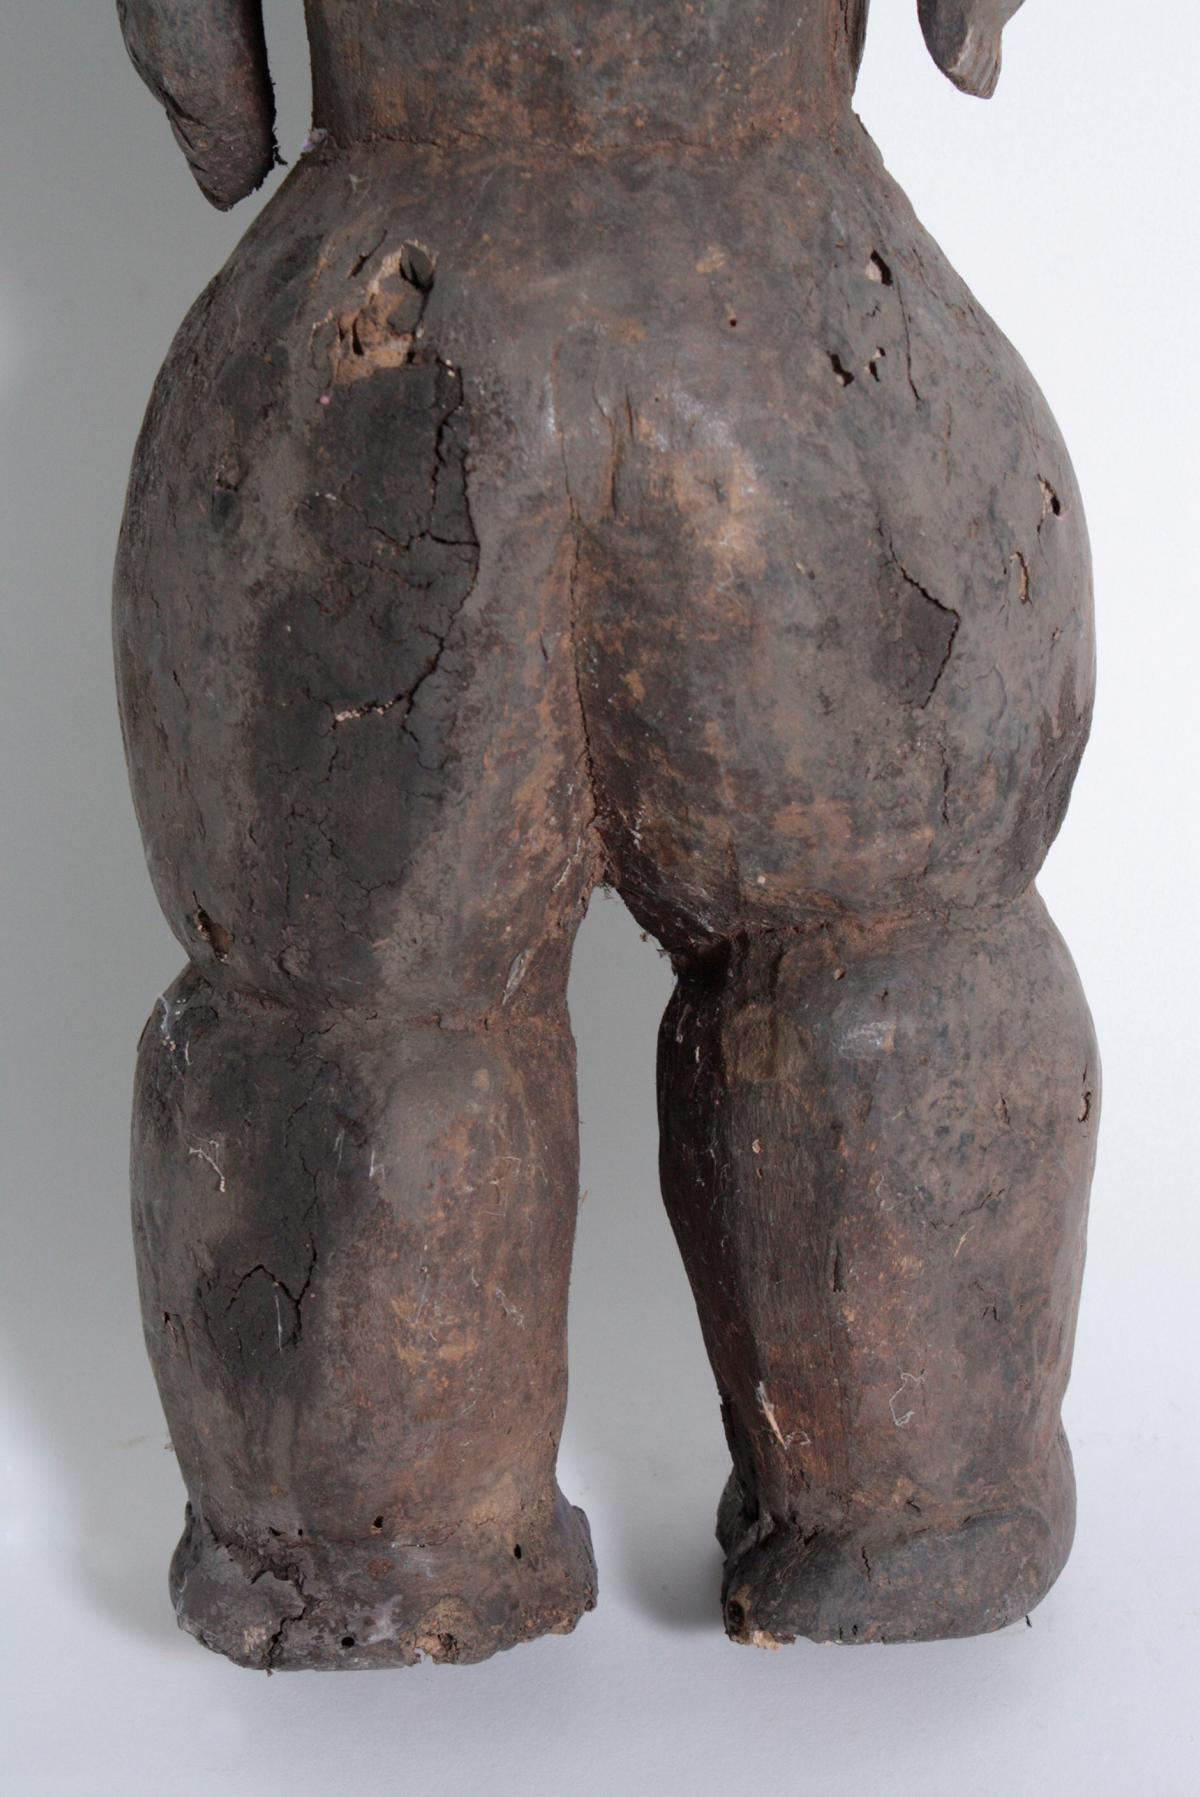 Ältere Ahnen-Figur, Tabwa, D. R. Kongo-10